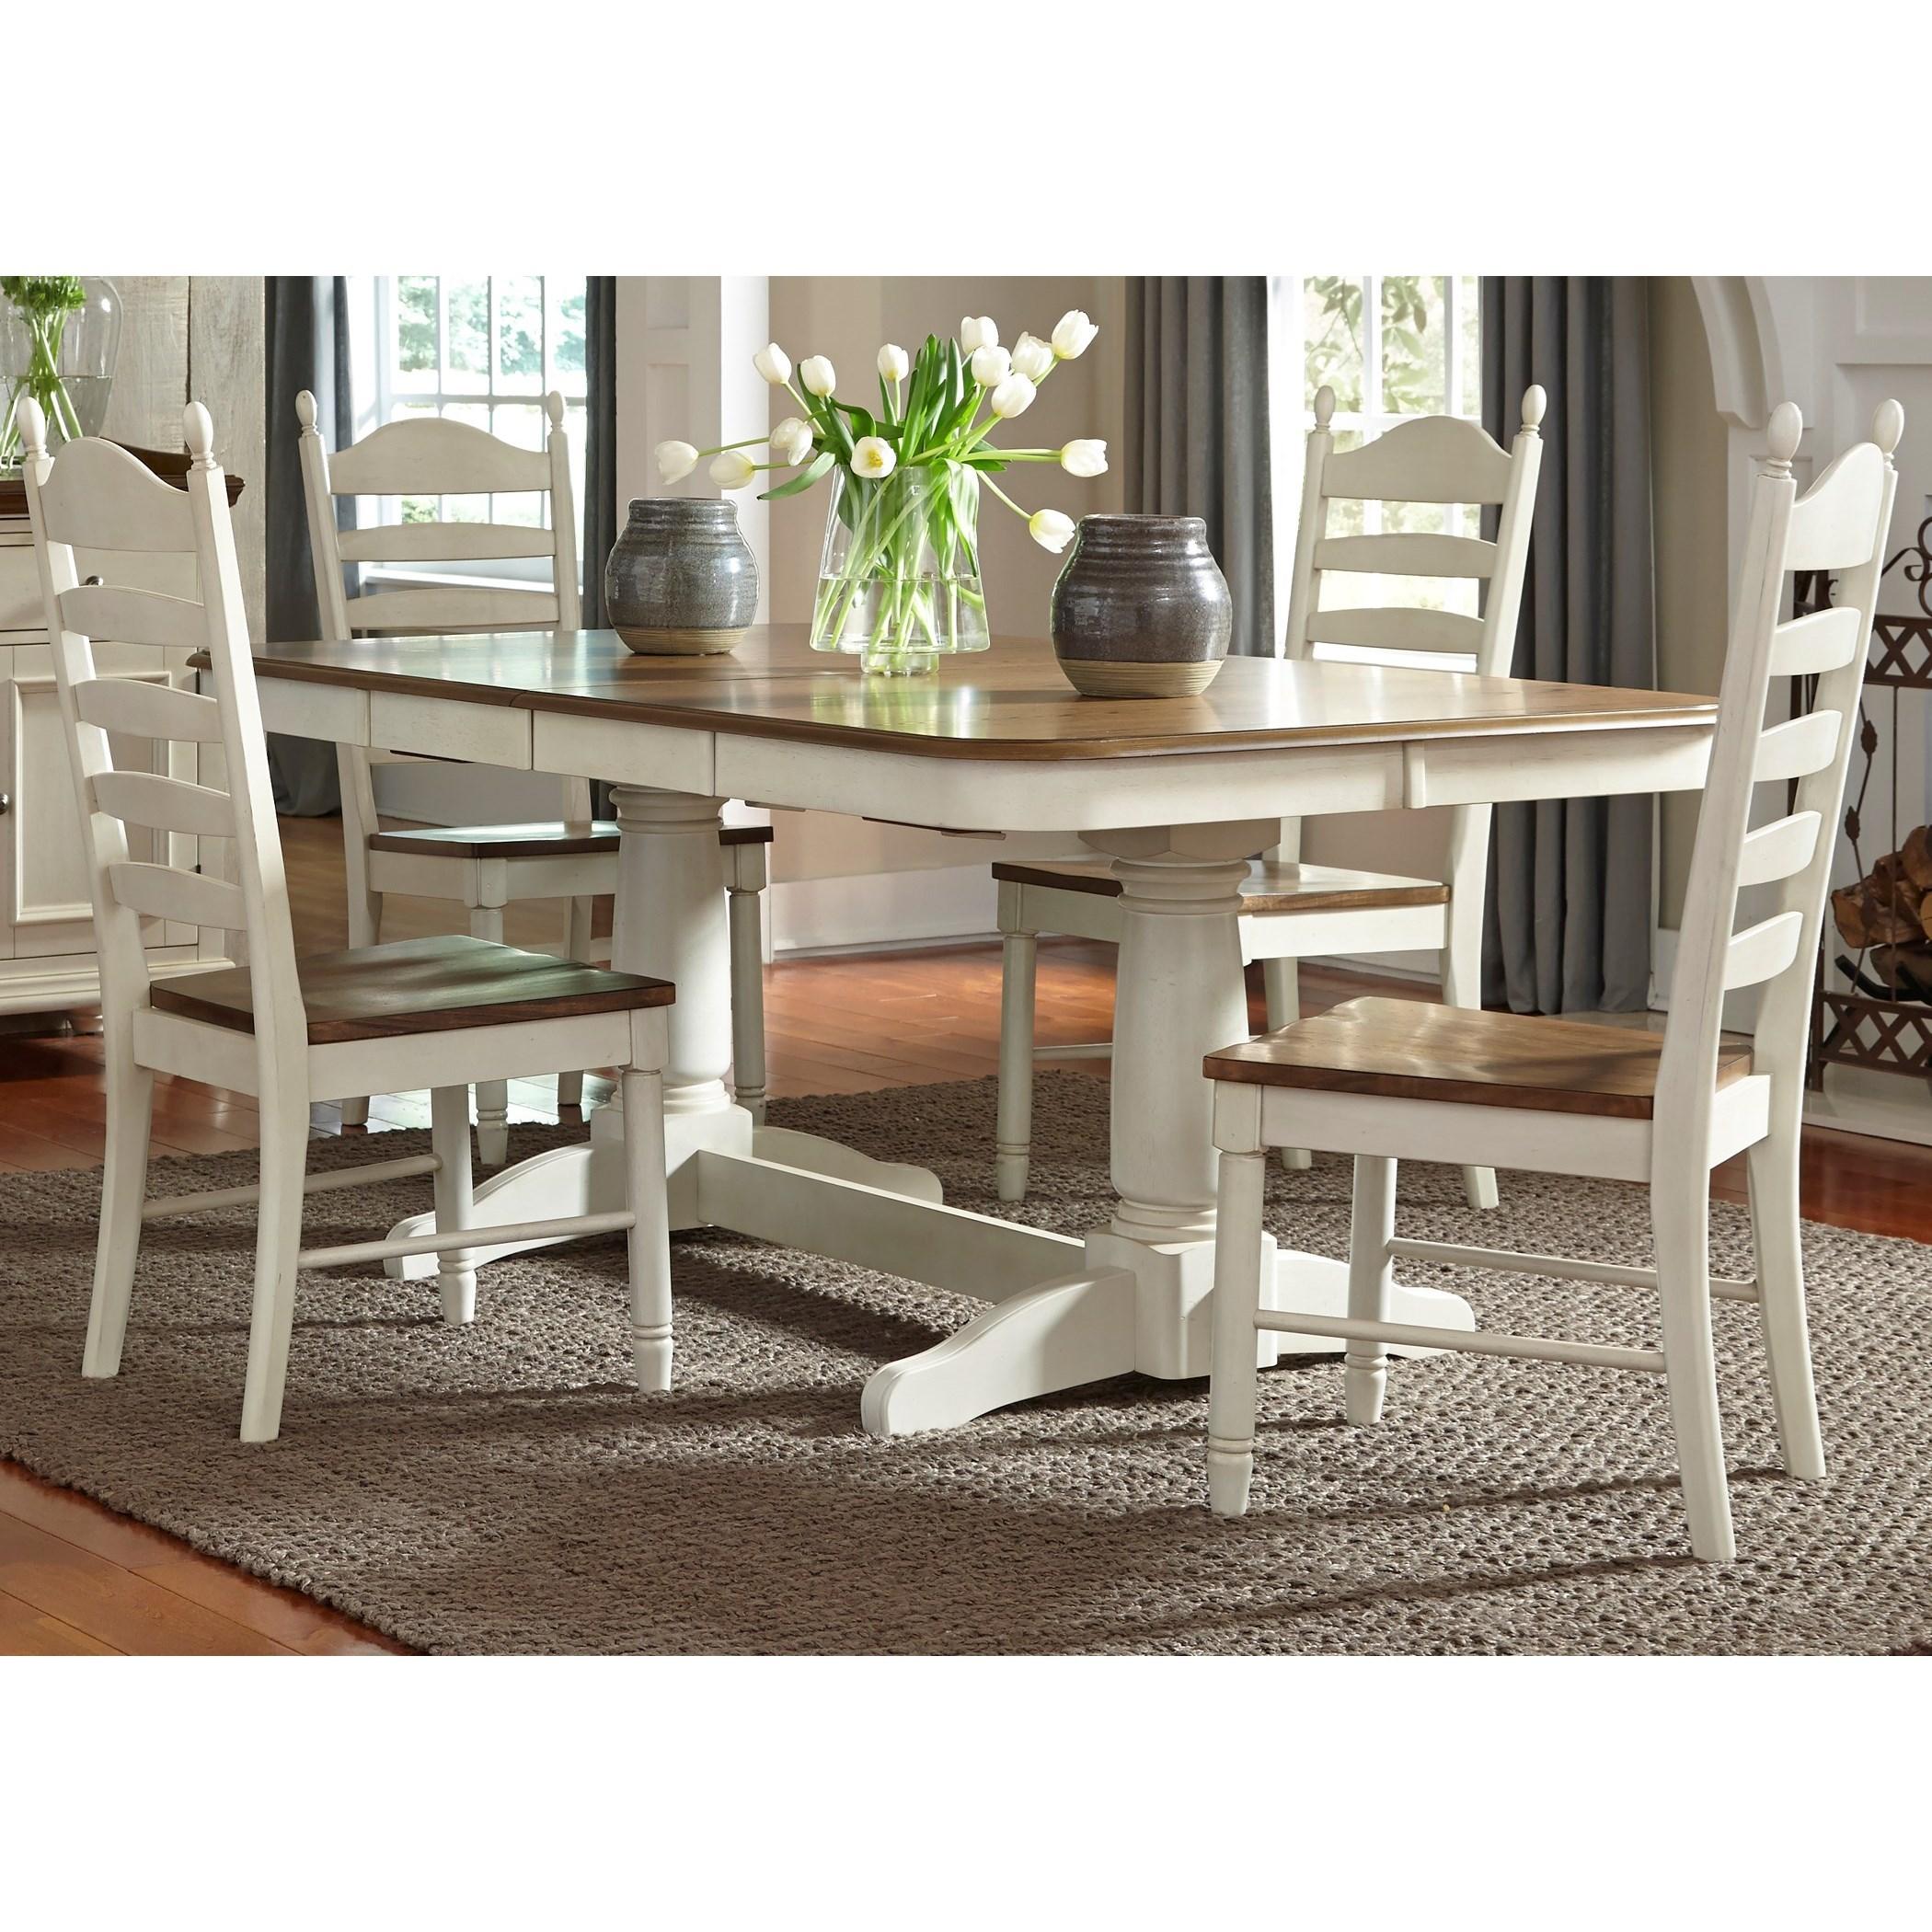 Merveilleux Liberty Furniture Springfield Dining 5 Piece Double Pedestal Table U0026 Chair  Set